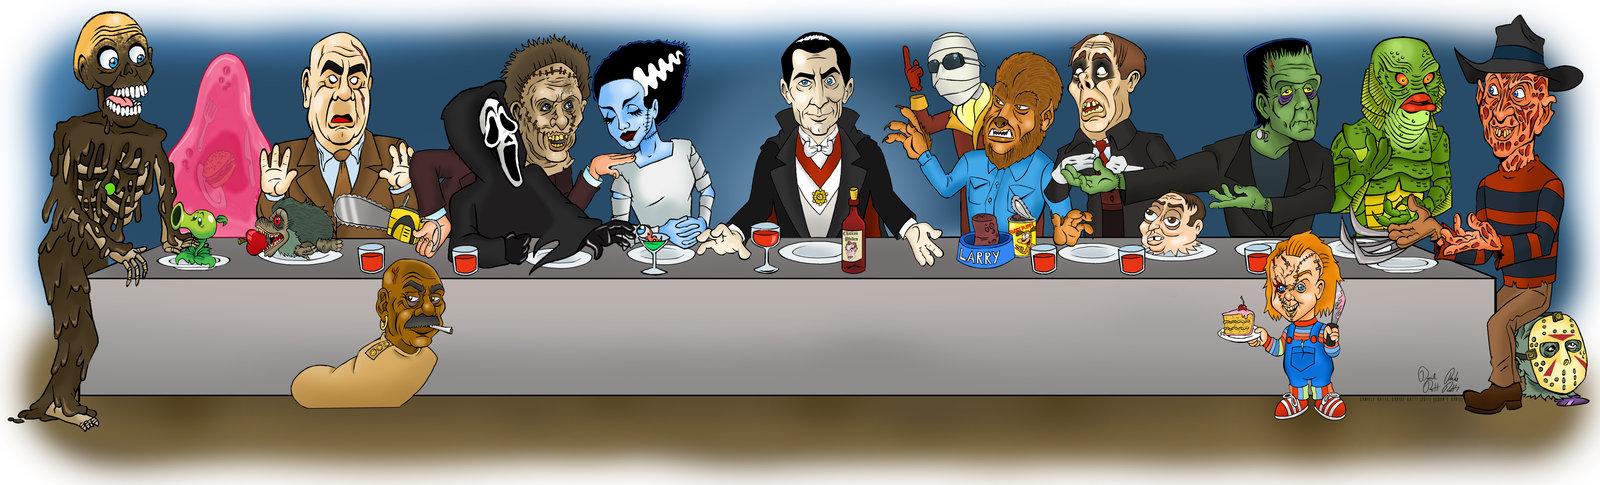 Horror Last Supper - Daniele & Davide Ratti & Davidez